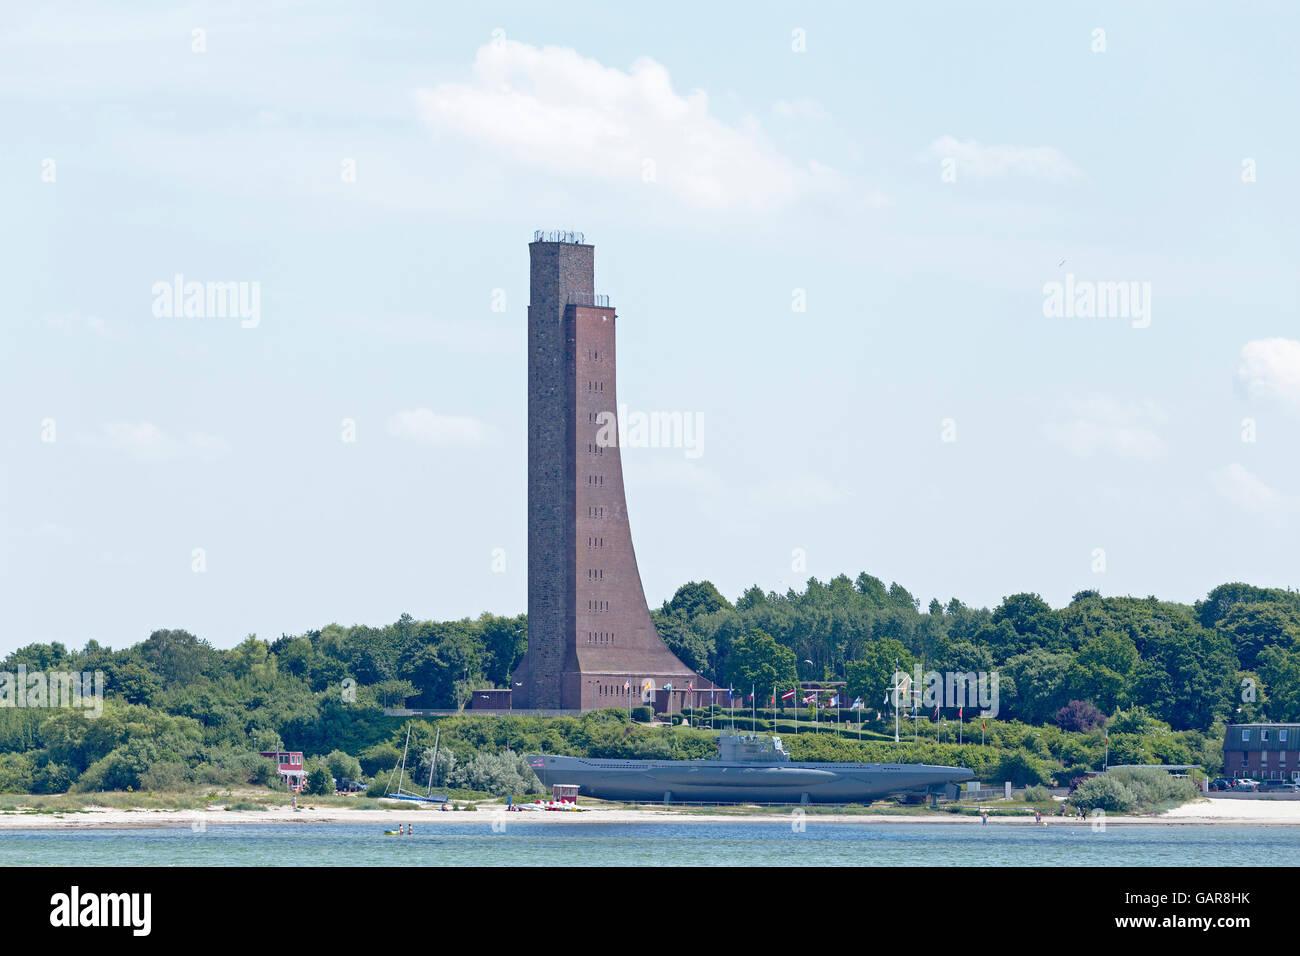 Laboe Naval Memorial, Kiel, Schleswig-Holstein, Germany - Stock Image